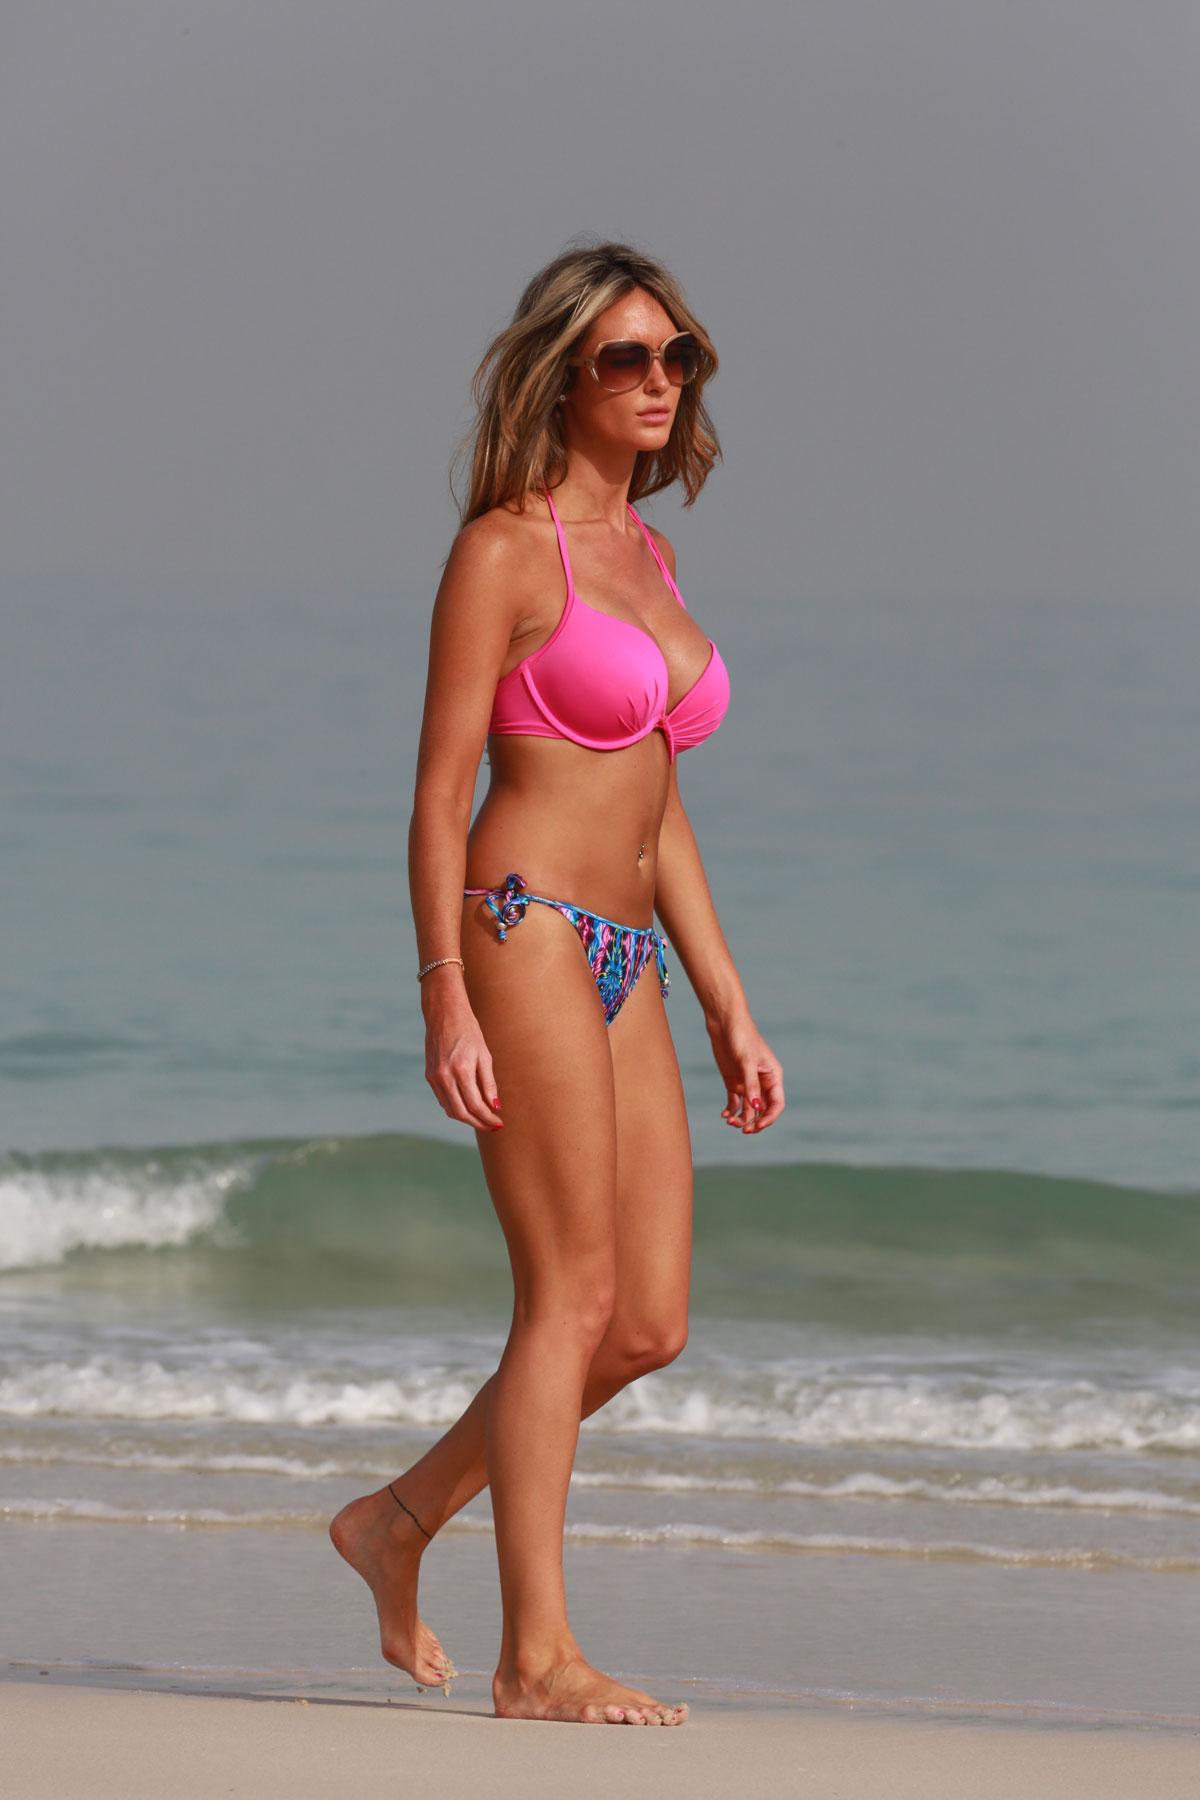 http://www.hawtcelebs.com/wp-content/uploads/2012/06/GEORGINA-DORSETT-in-Bikini-on-the-Beach-in-Dubai-4.jpg